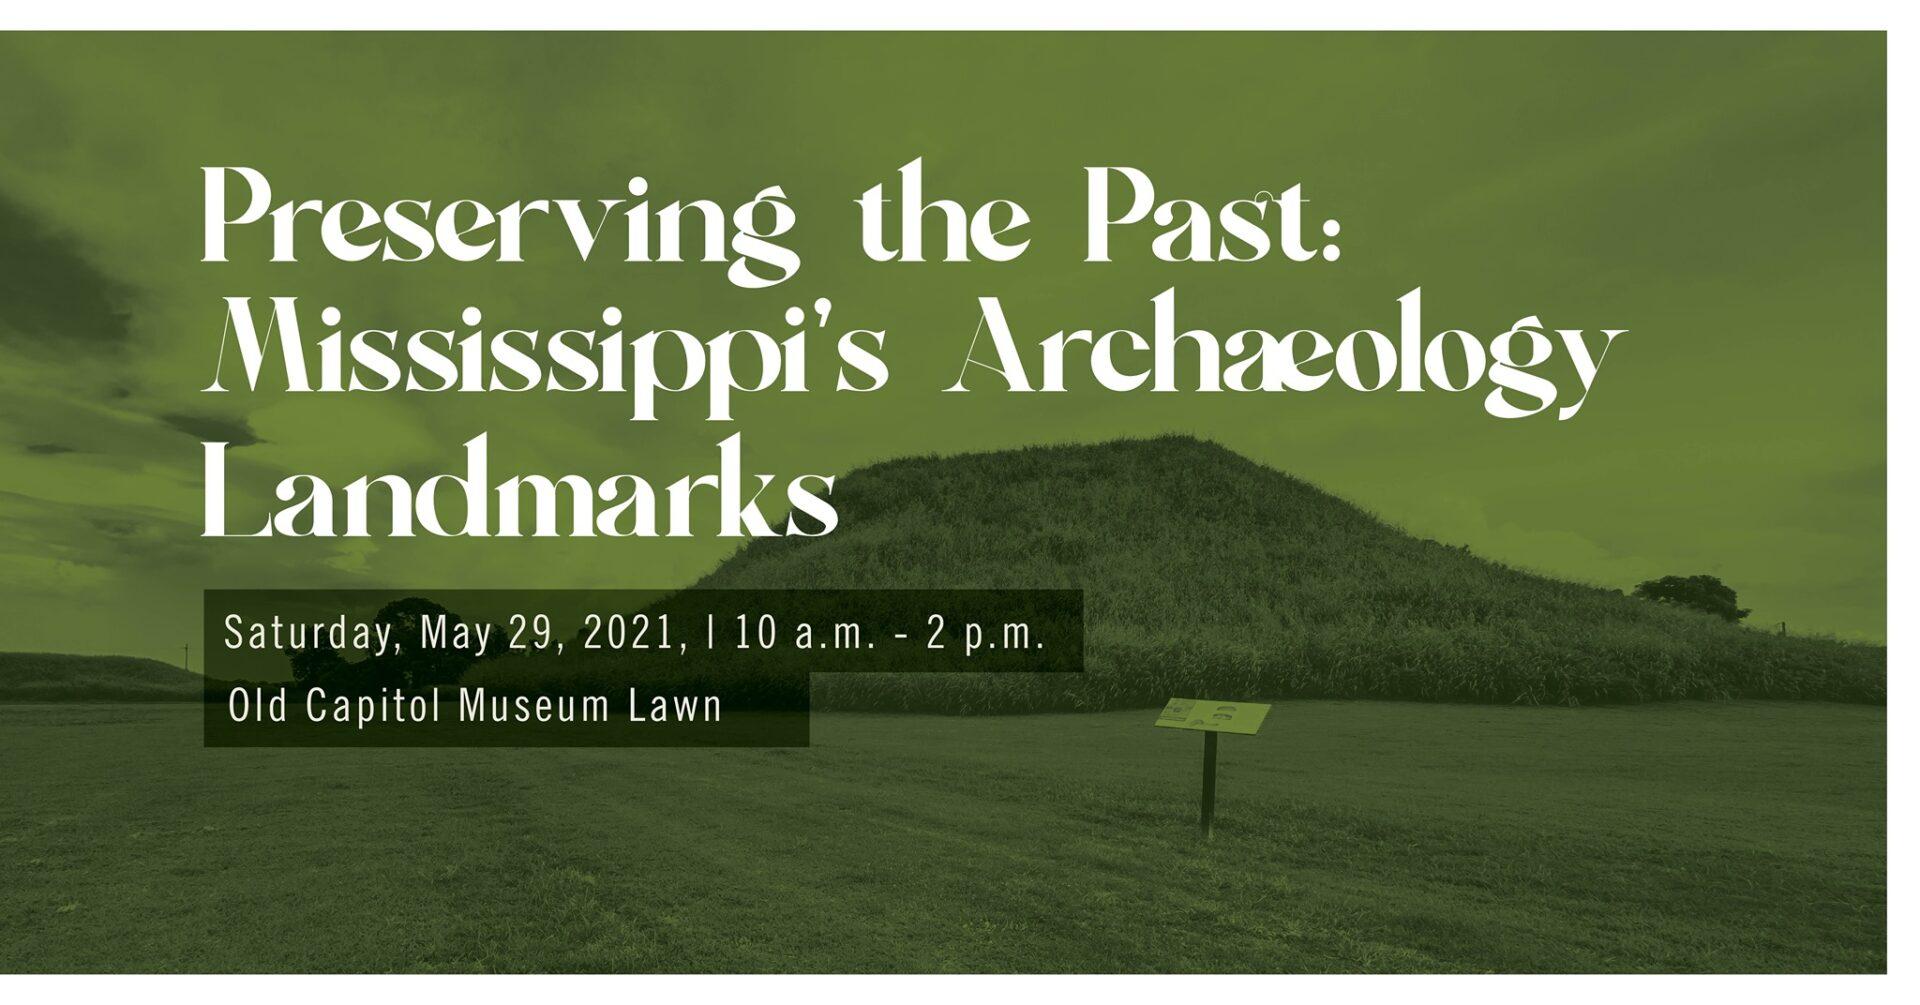 Preserving the Past: Mississippi's Archaeology Landmarks